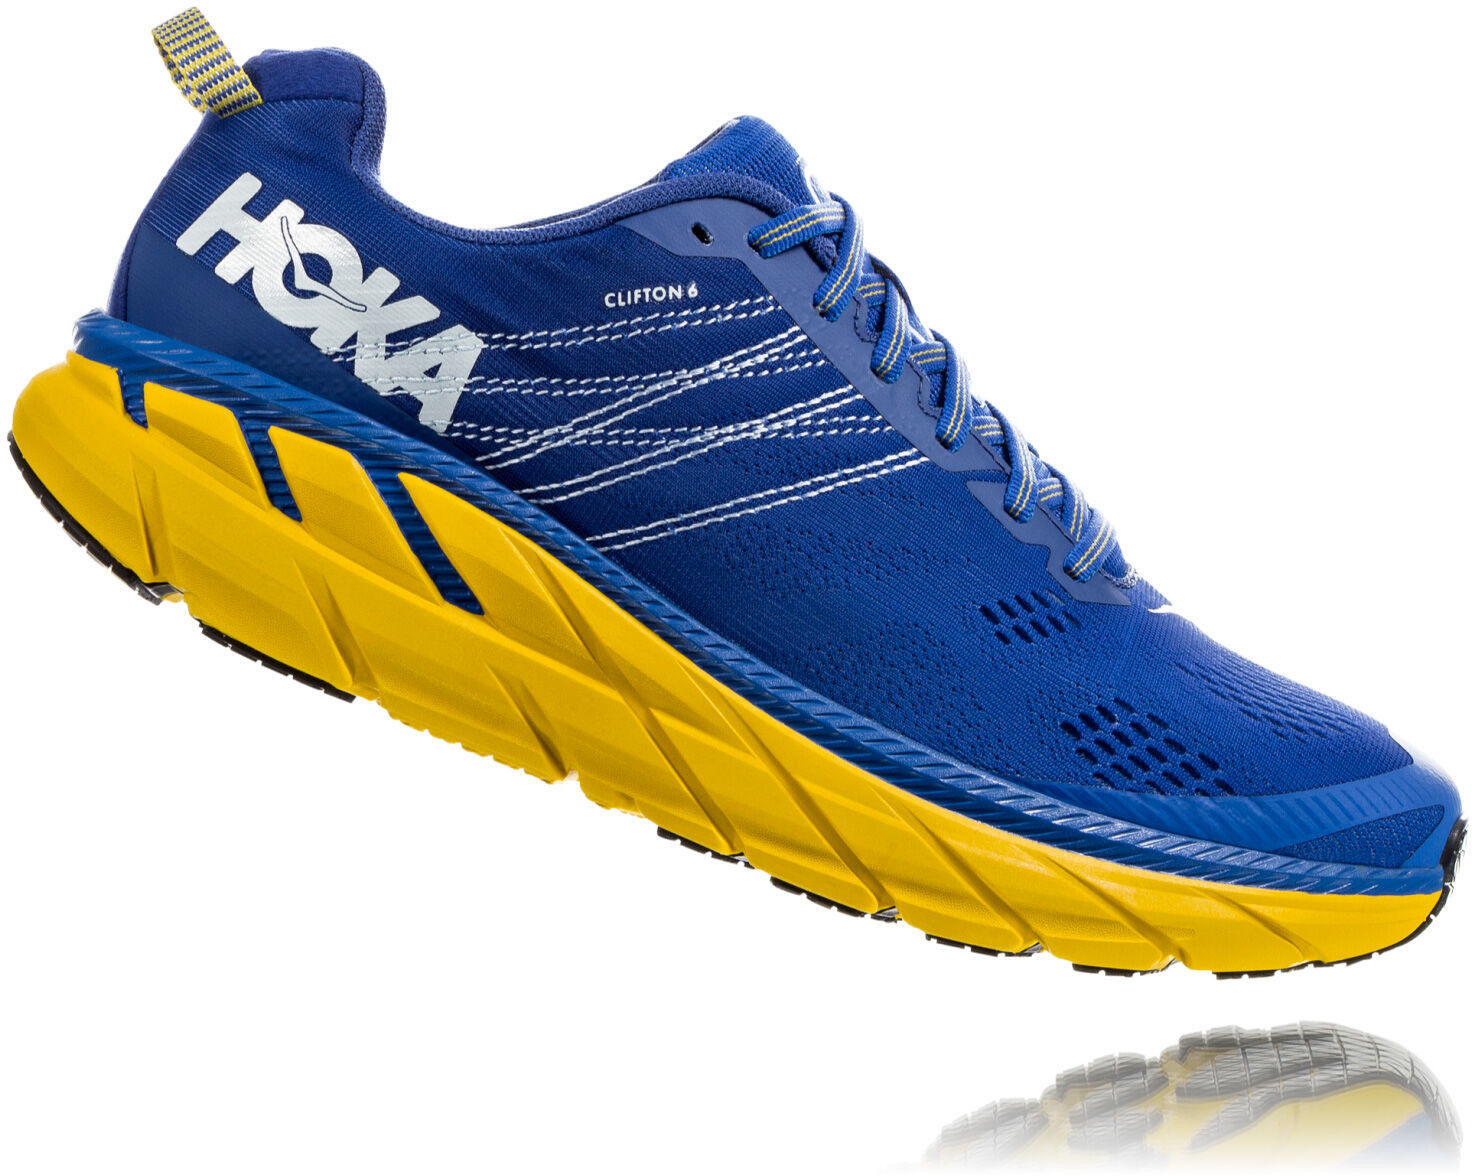 Hoka One One Clifton 6 Laufschuhe Herren nebulas blue lemon1920x1920 - Vild med løb? Prøv de nye innovative HOKA løbesko